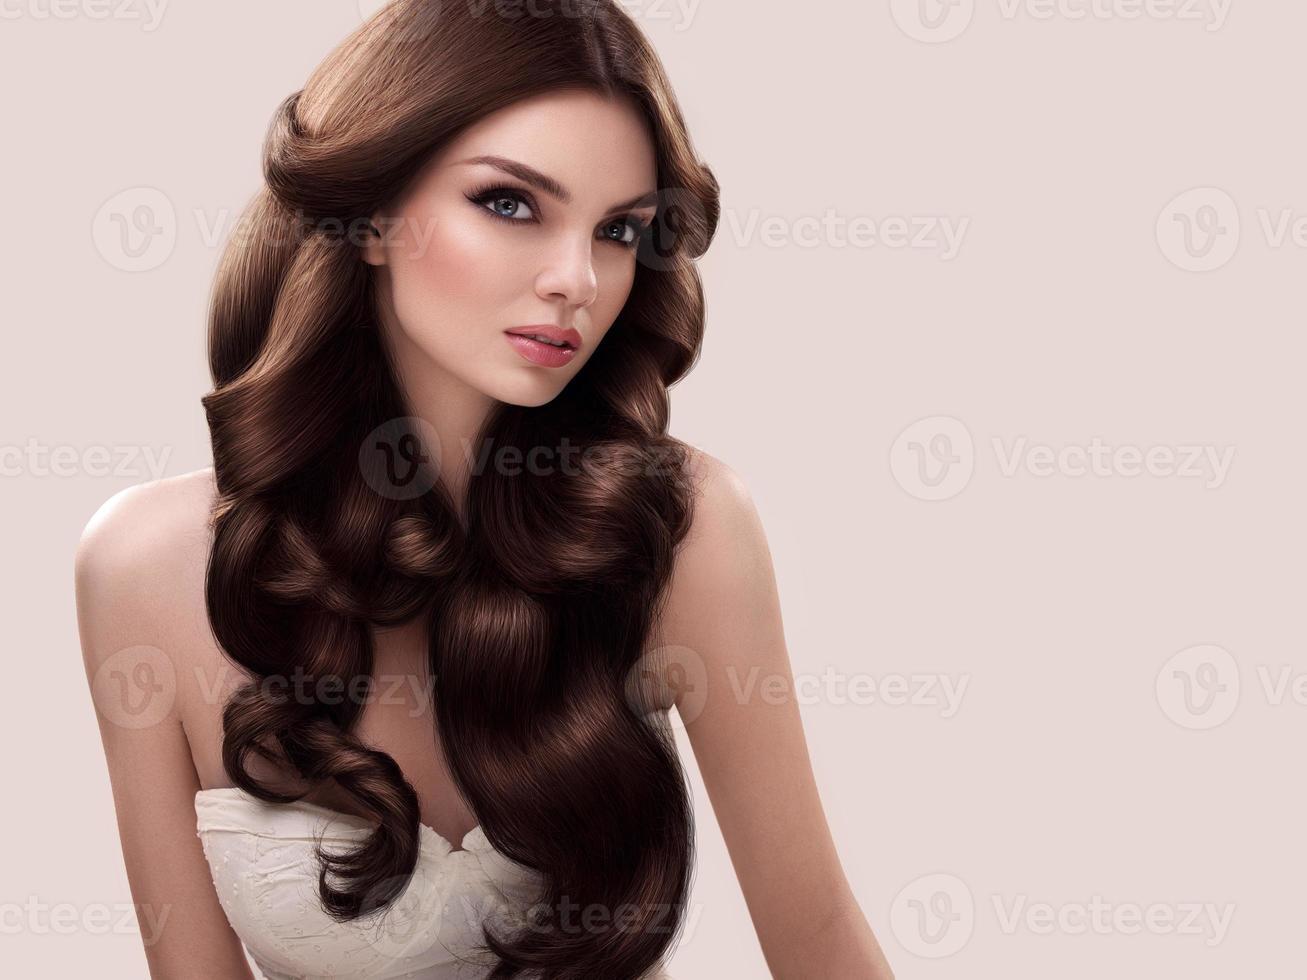 Hair. Portrait of Beautiful Woman's Long Wavy Hair. High quality photo